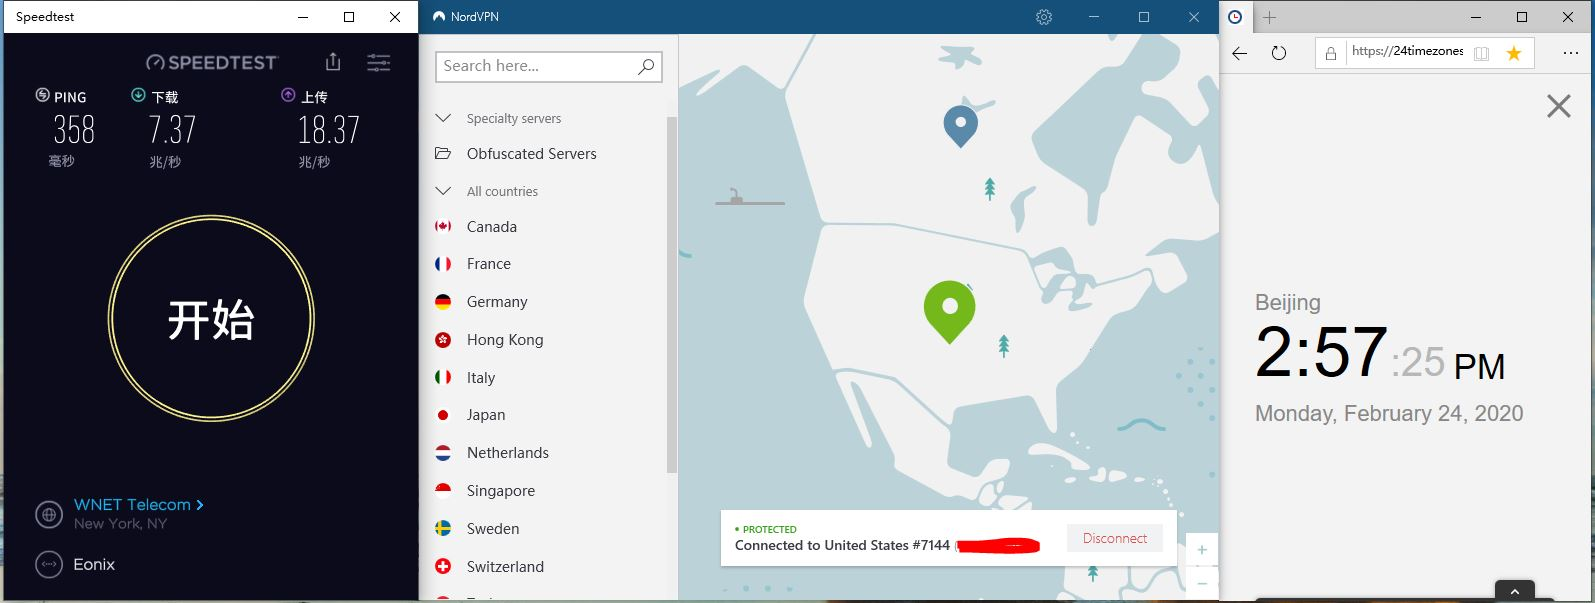 Windows10 NordsVPN USA - 7144 中国VPN翻墙 科学上网 SpeedTest测试 - 20200224